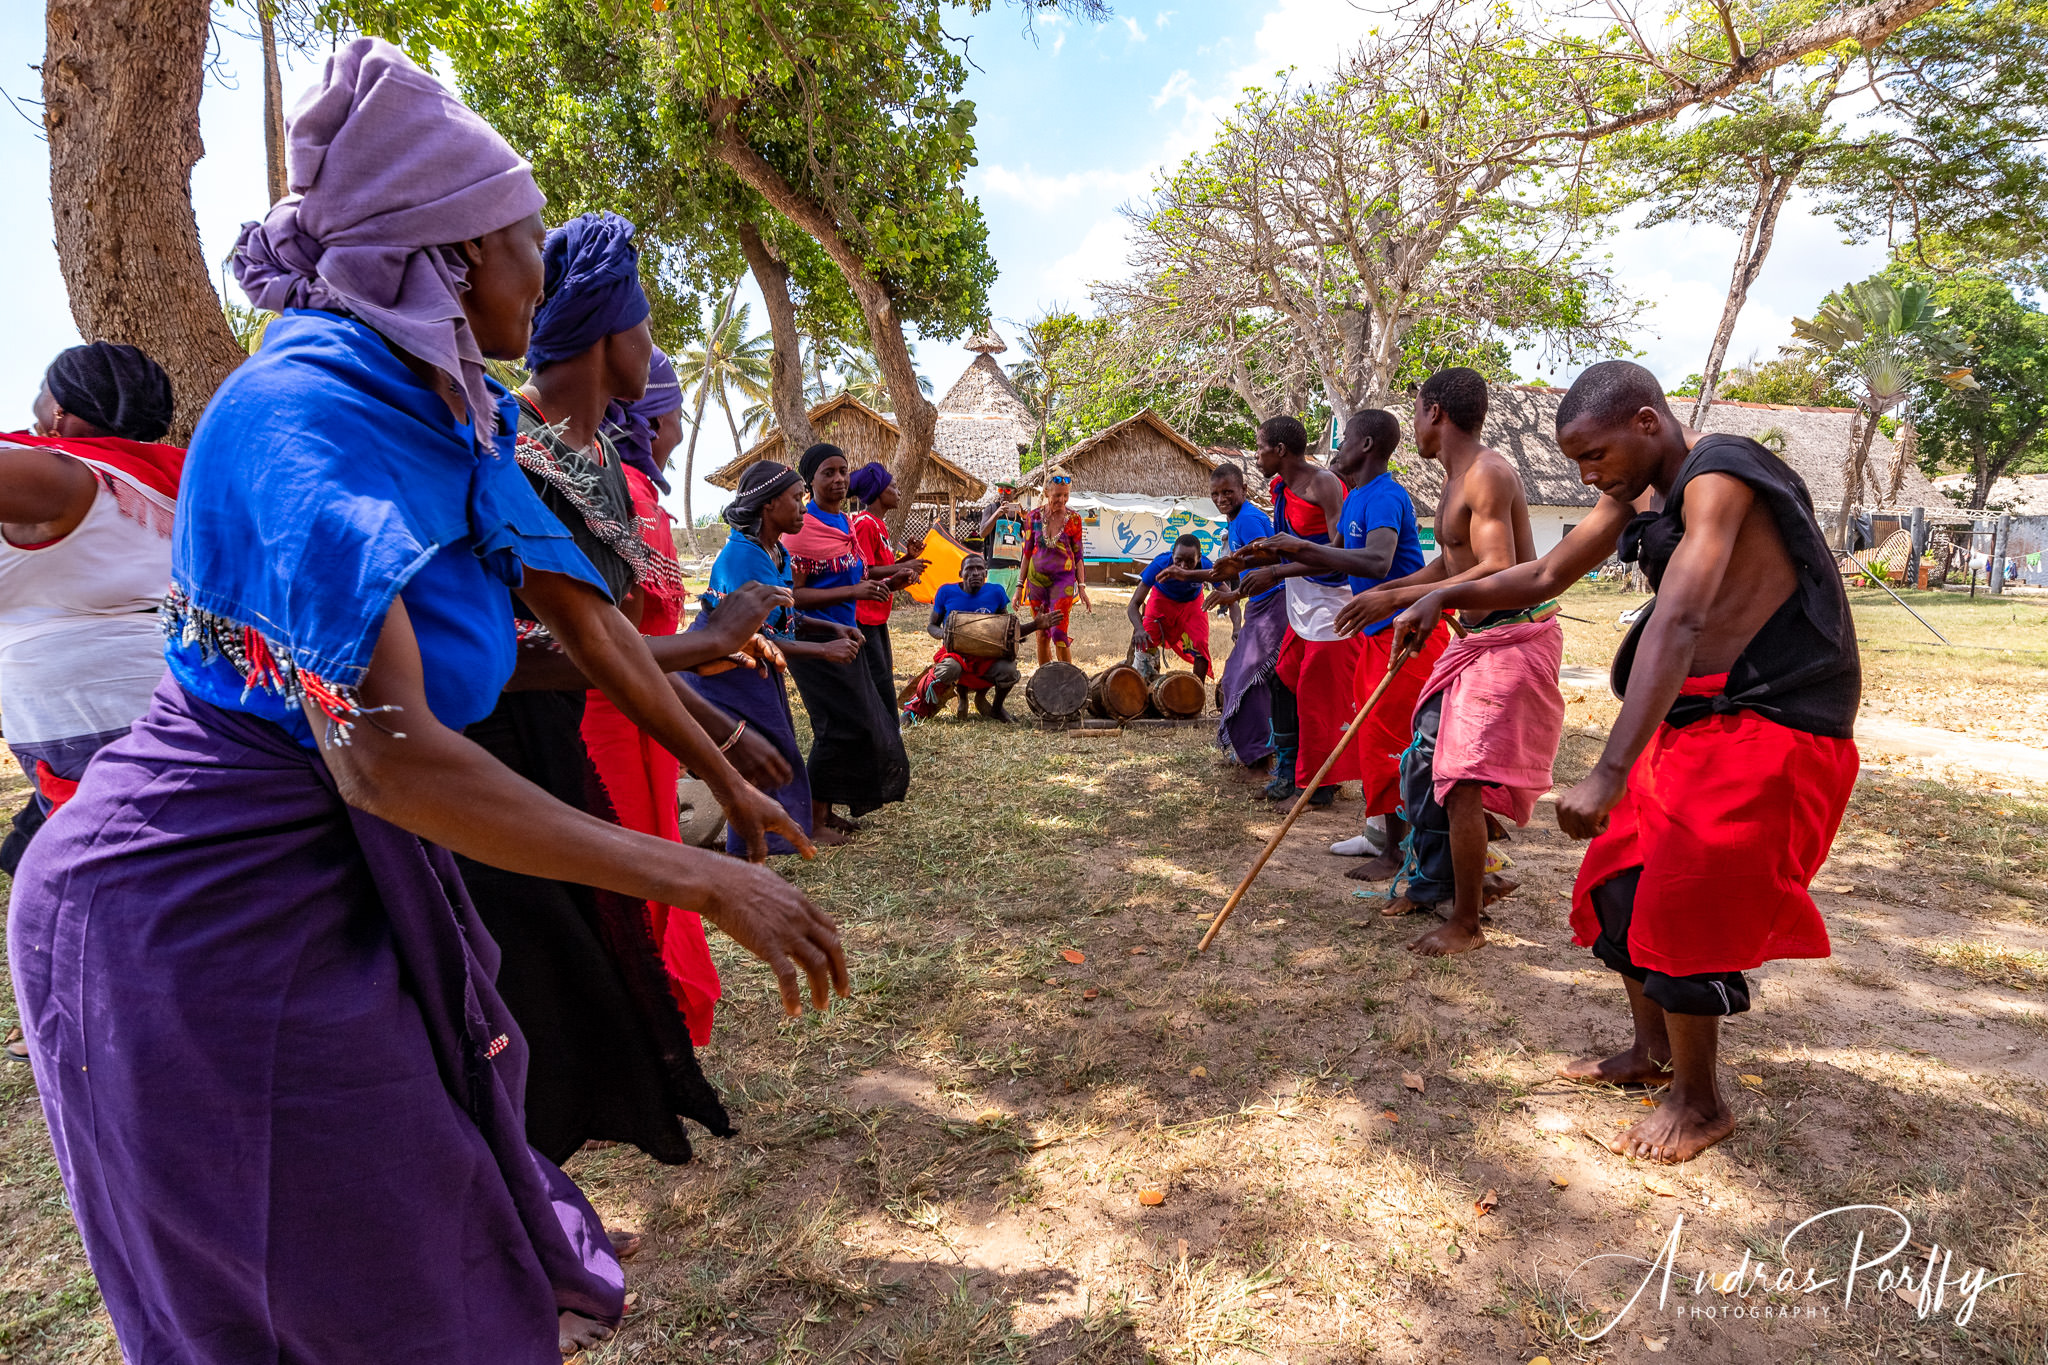 Dancing with bells and drums diani regatta kenya